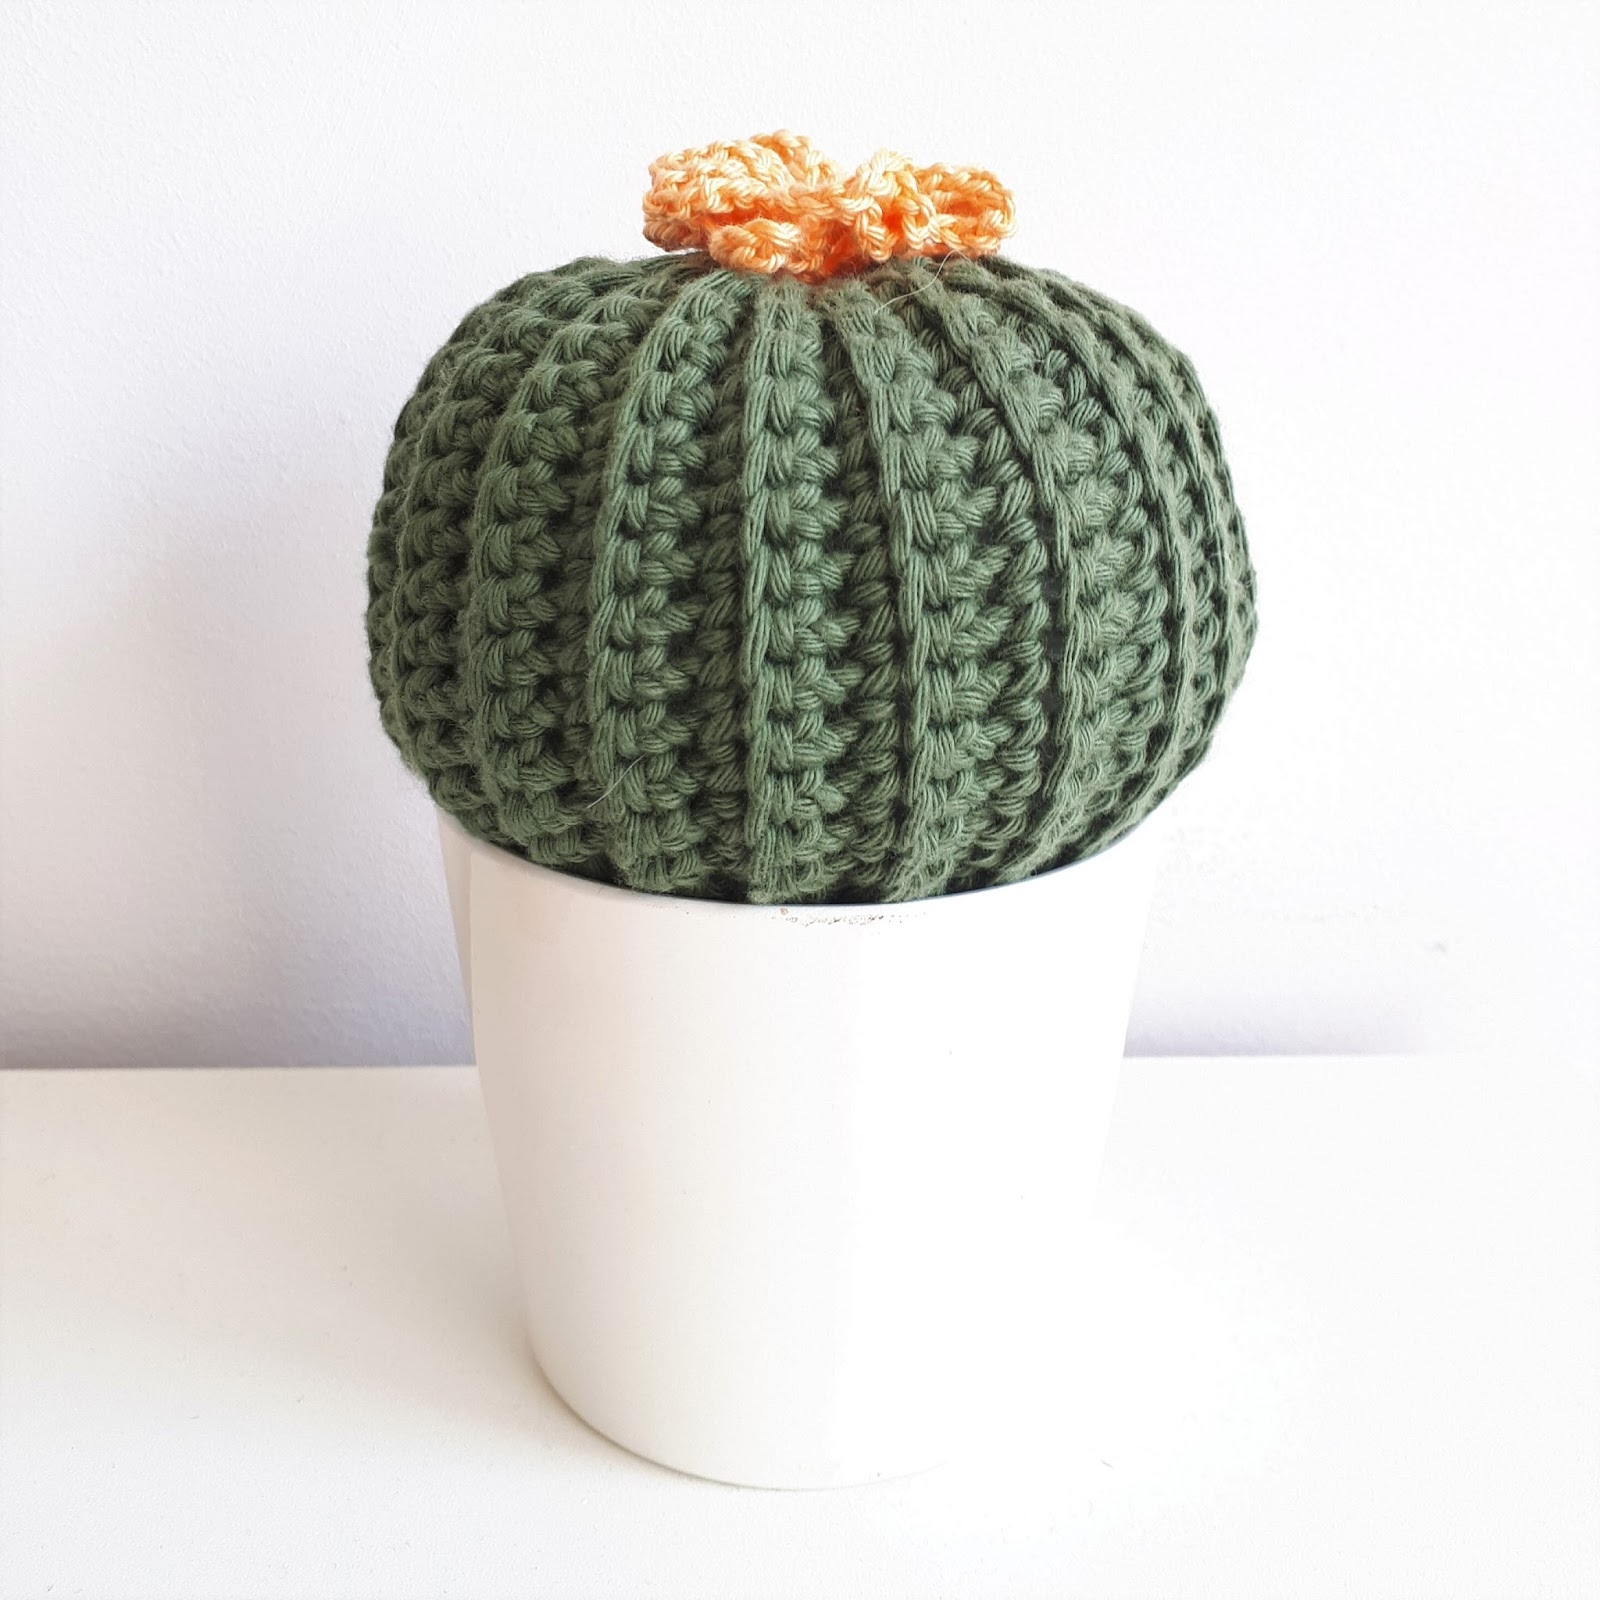 Beroemd Haak by Daphne: Cactus #NJ04